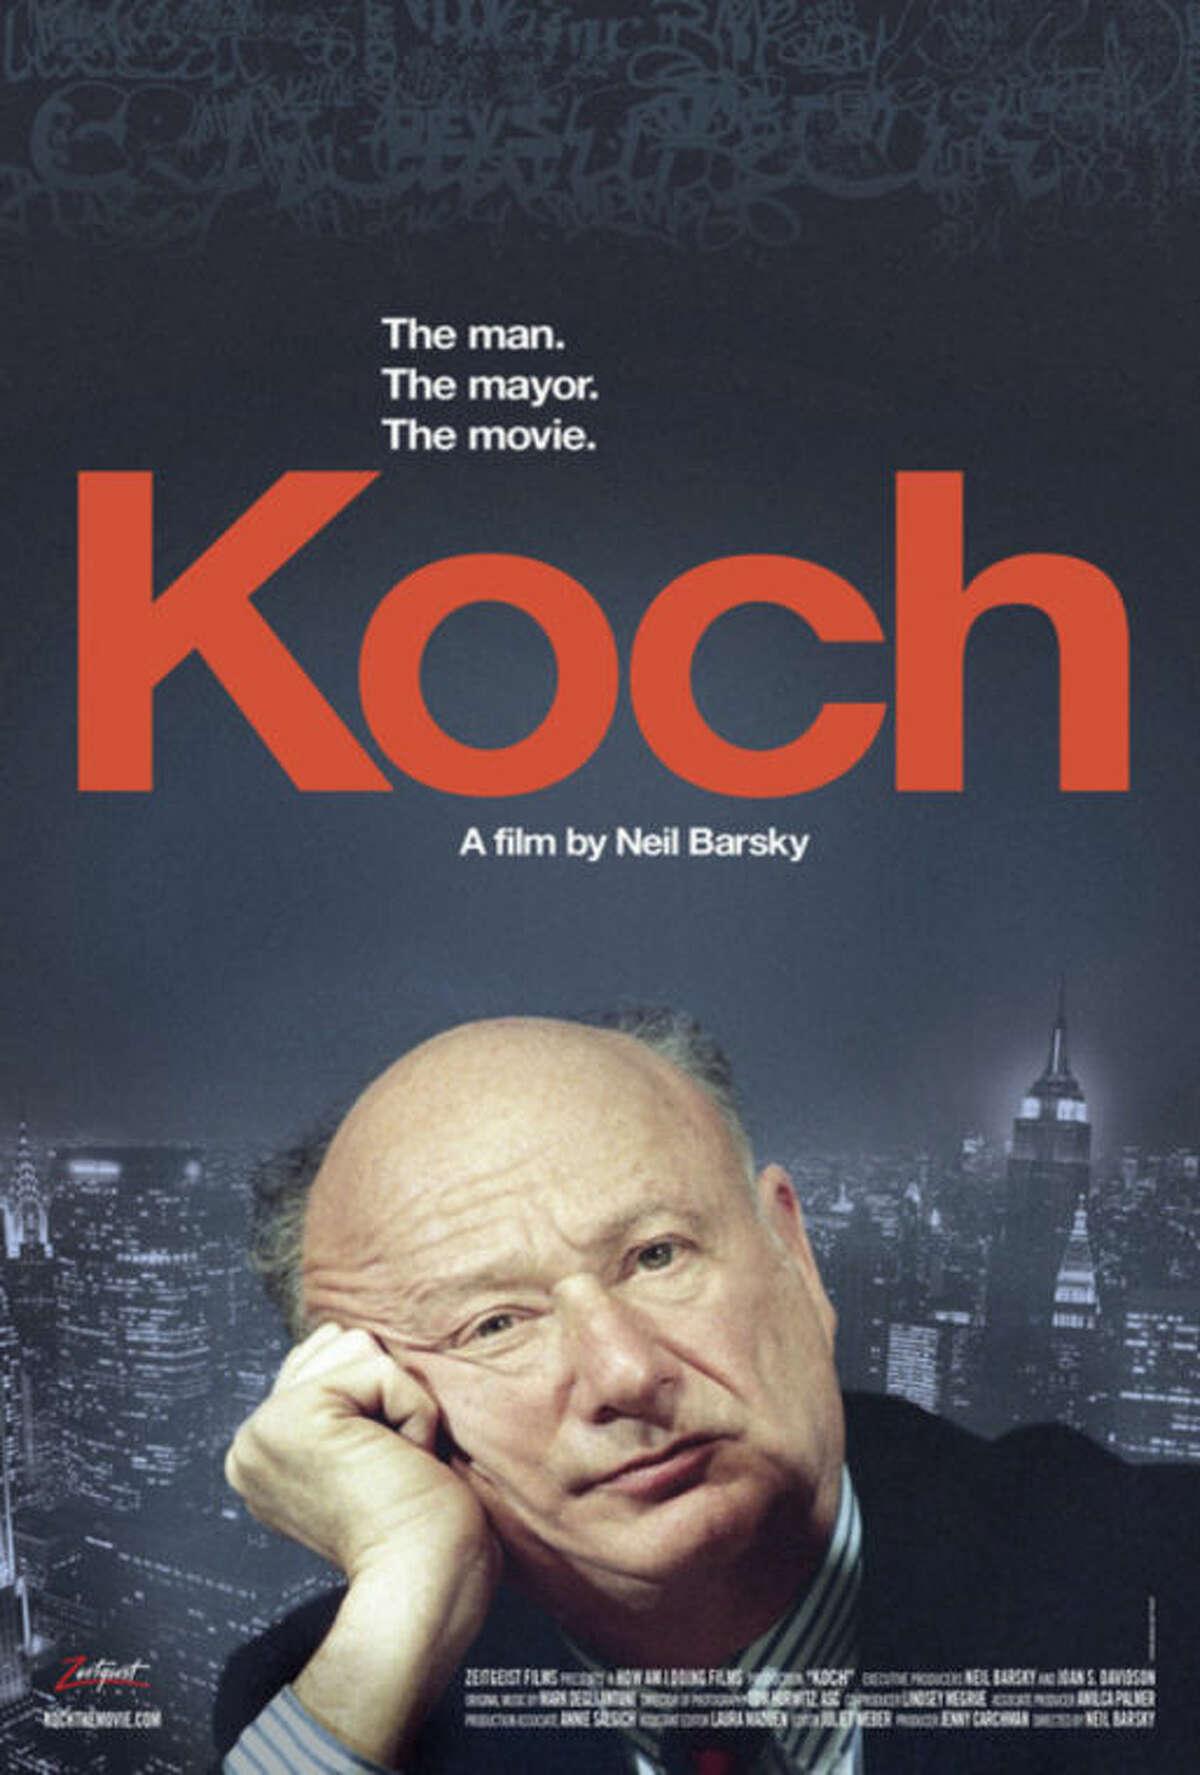 How Ed Koch changed New York City